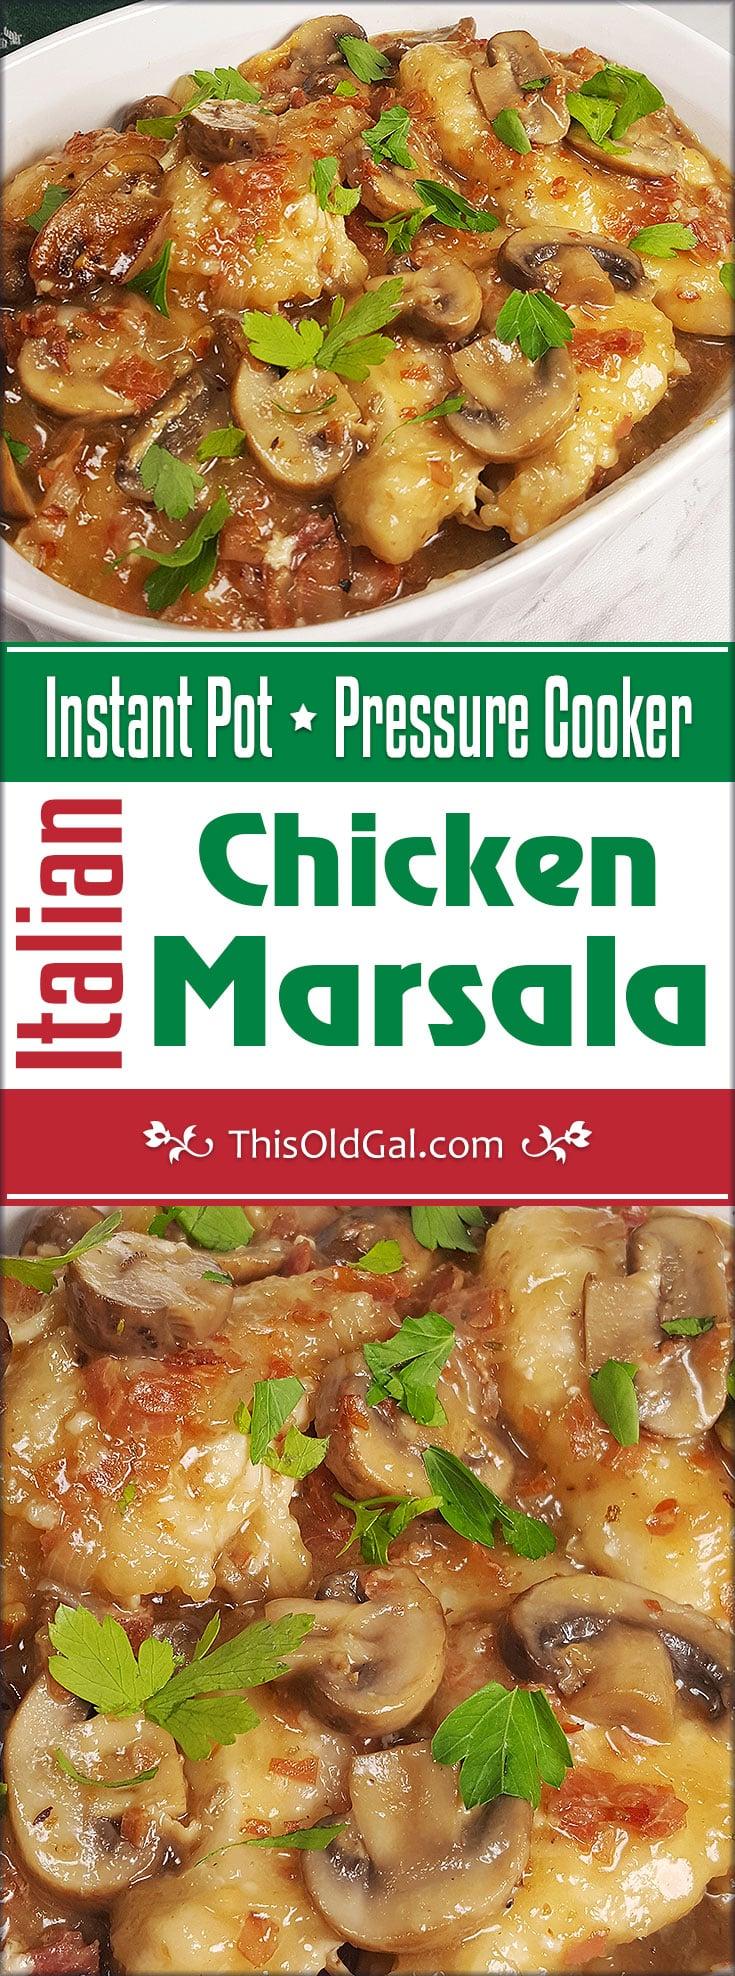 Instant Pot Pressure Cooker Italian Chicken Marsala